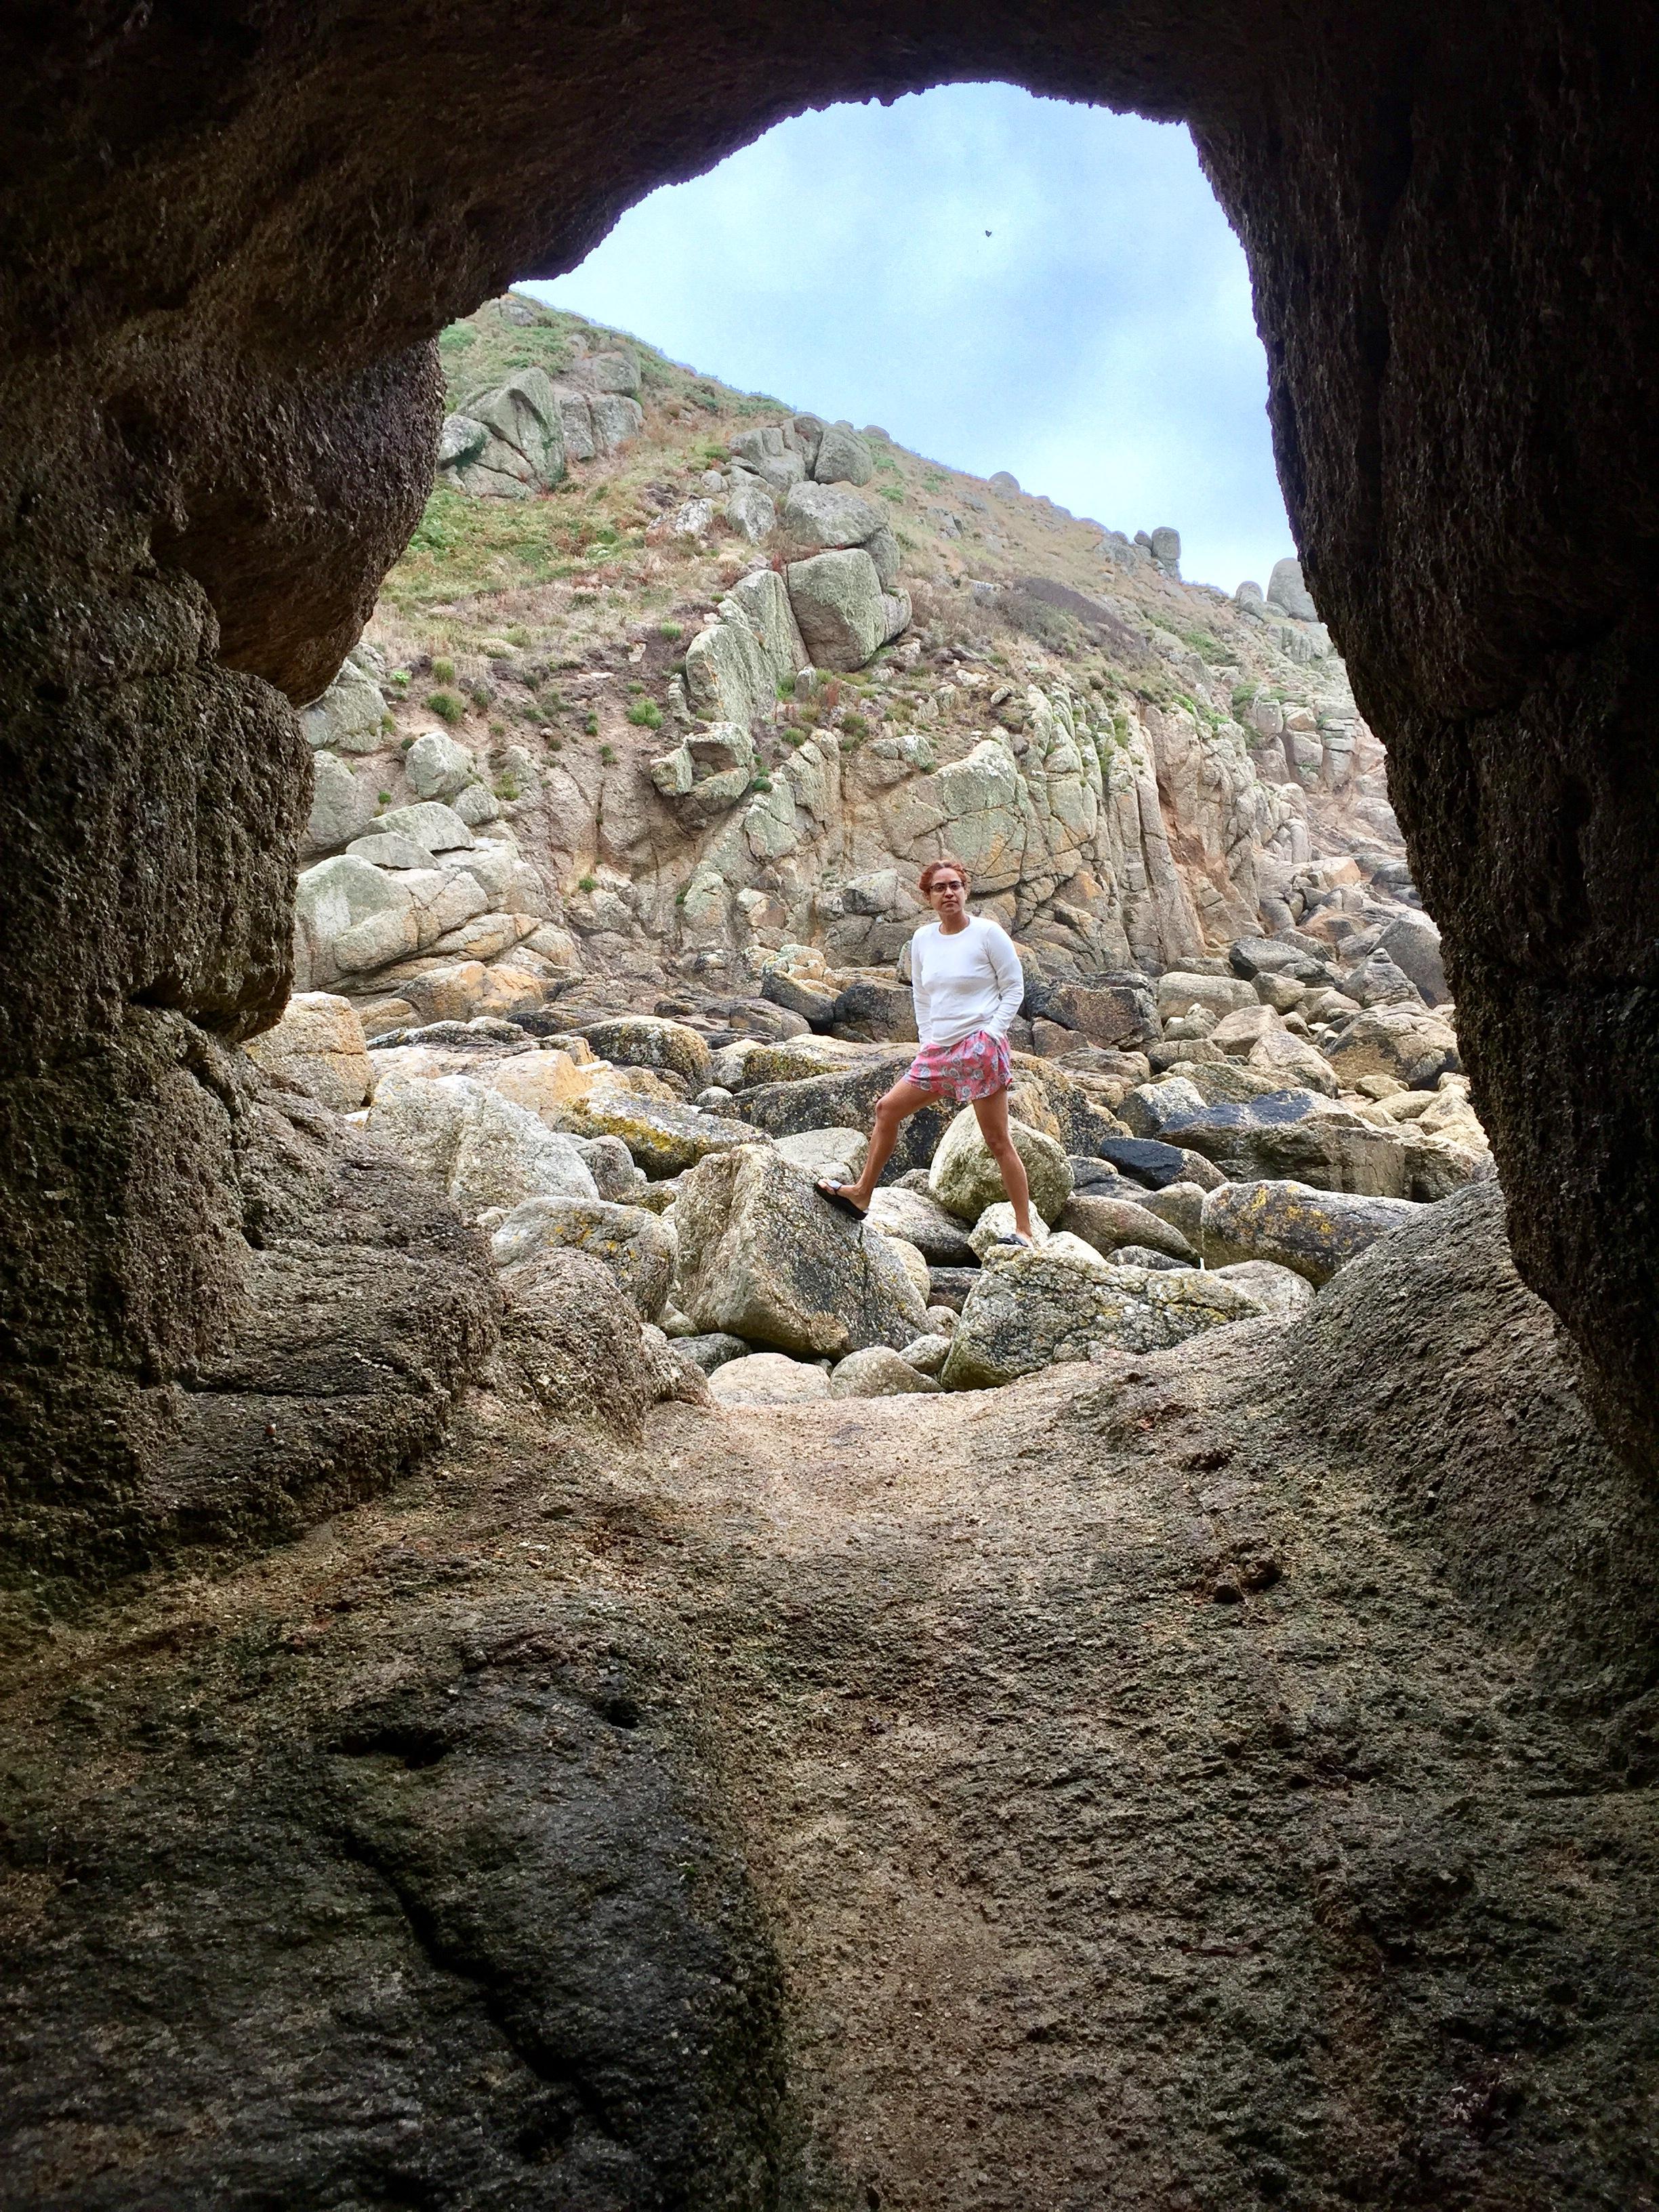 The craggy shoreline of Cornwall